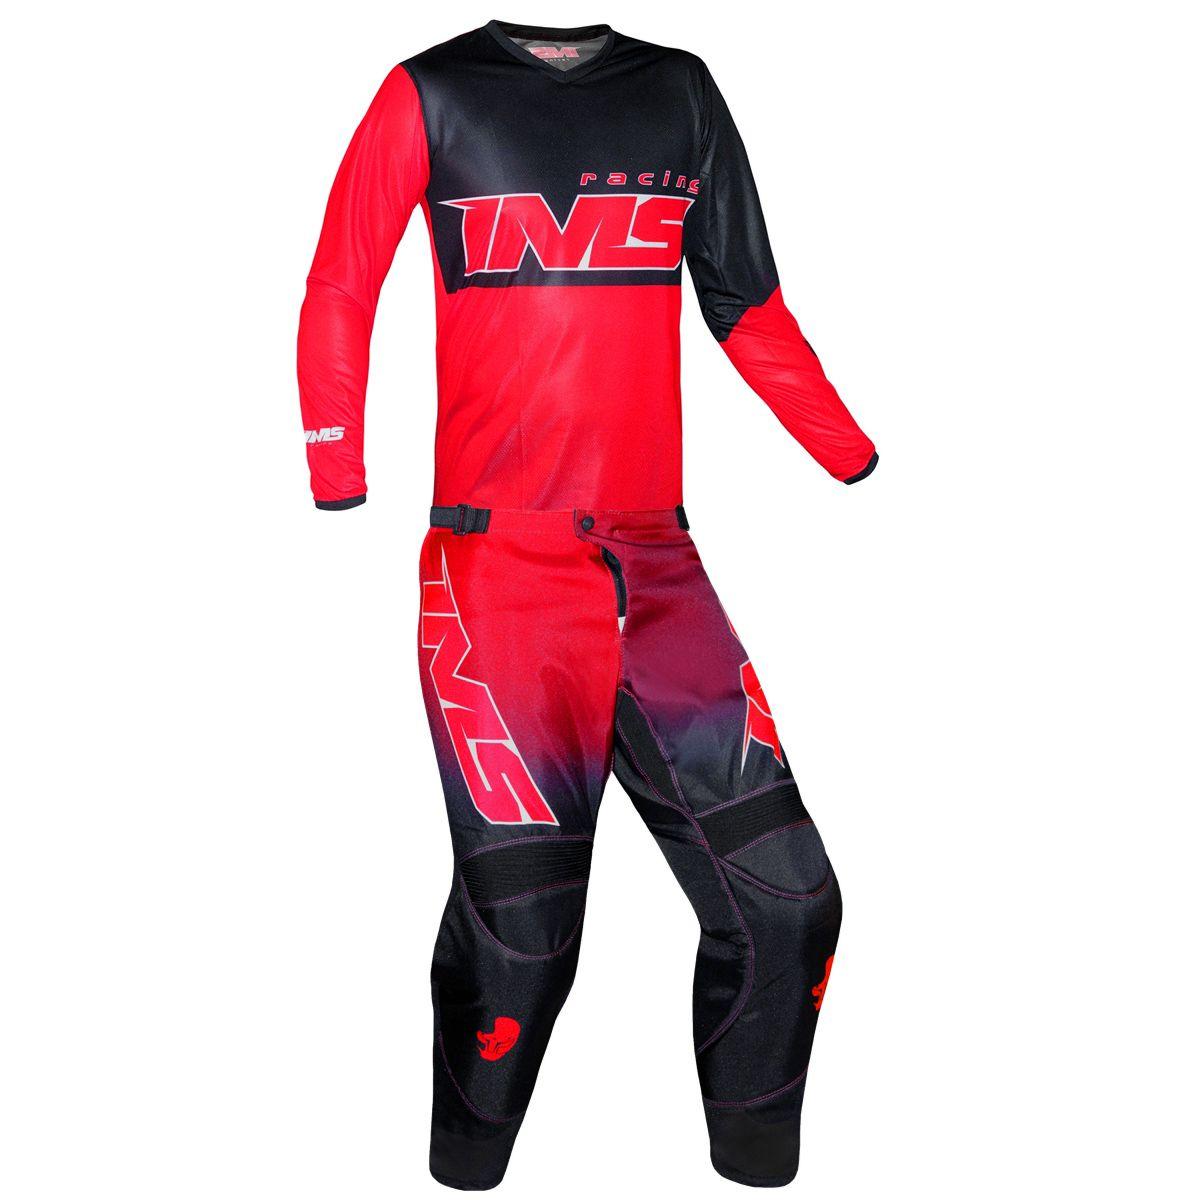 Conjunto Roupa Calça Camisa Ims Army Vermelho